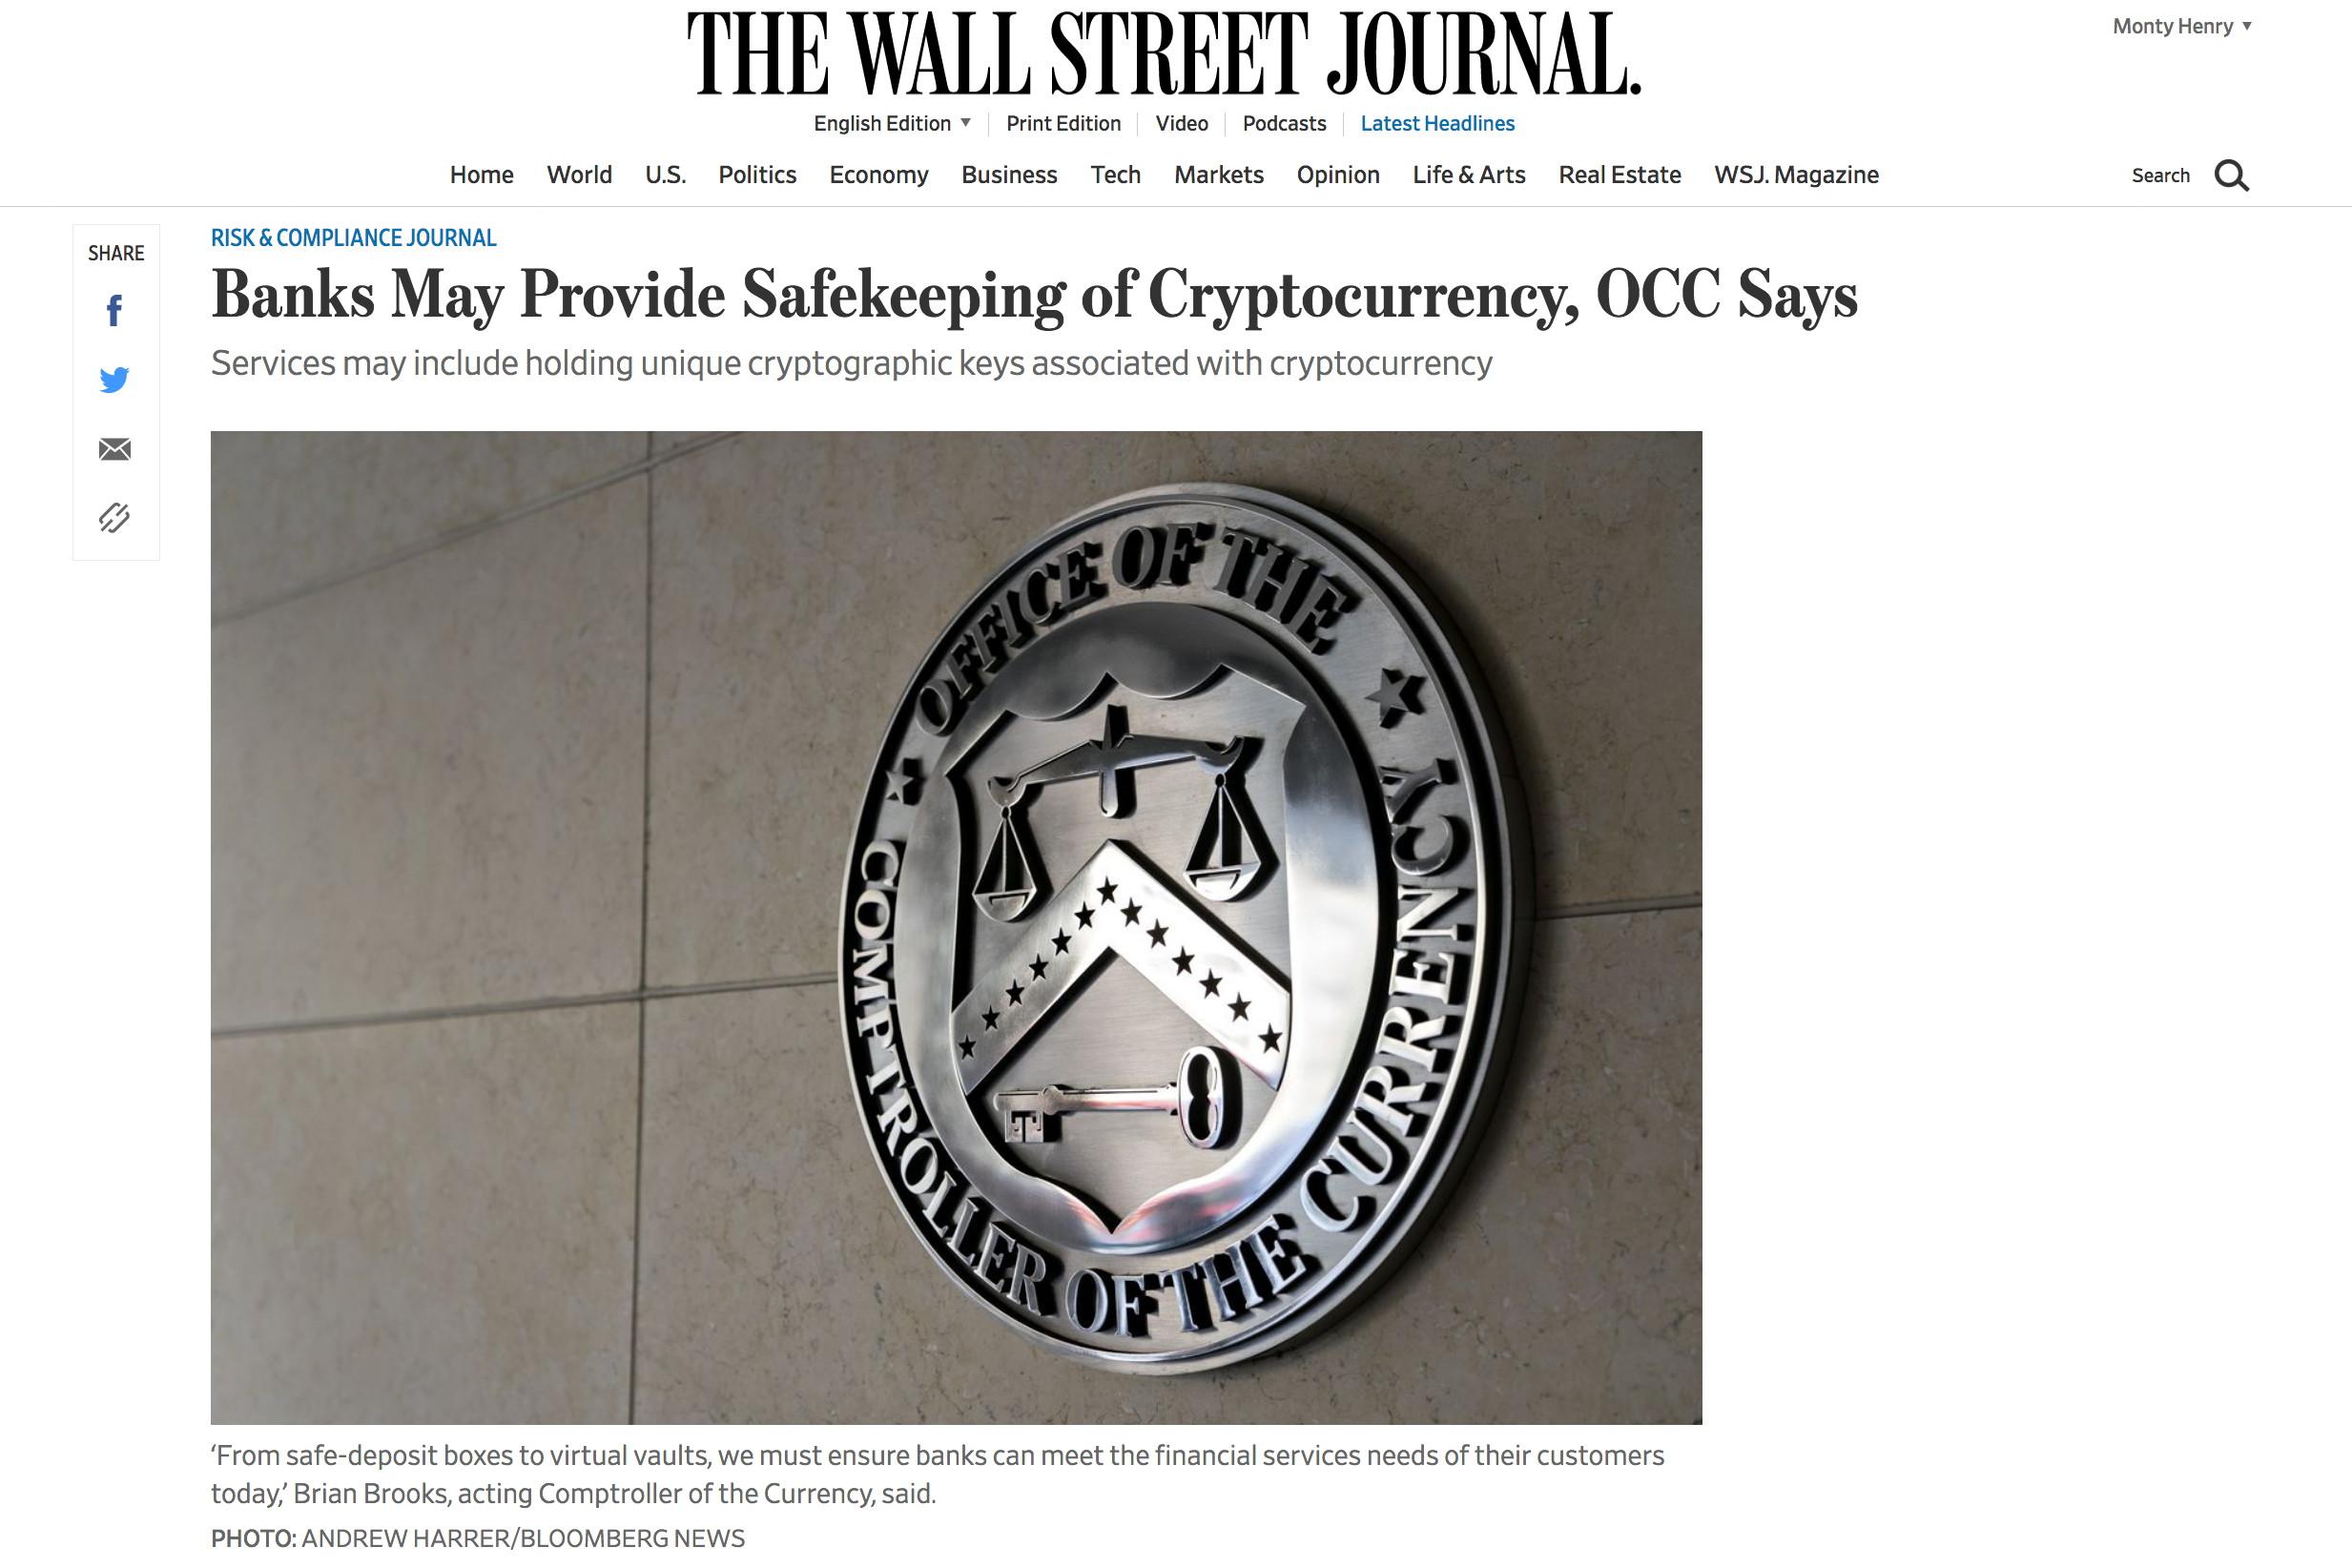 US Banking Regulator Greenlights Crypto Custody At Federally Chartered Banks (#GotBitcoin?)